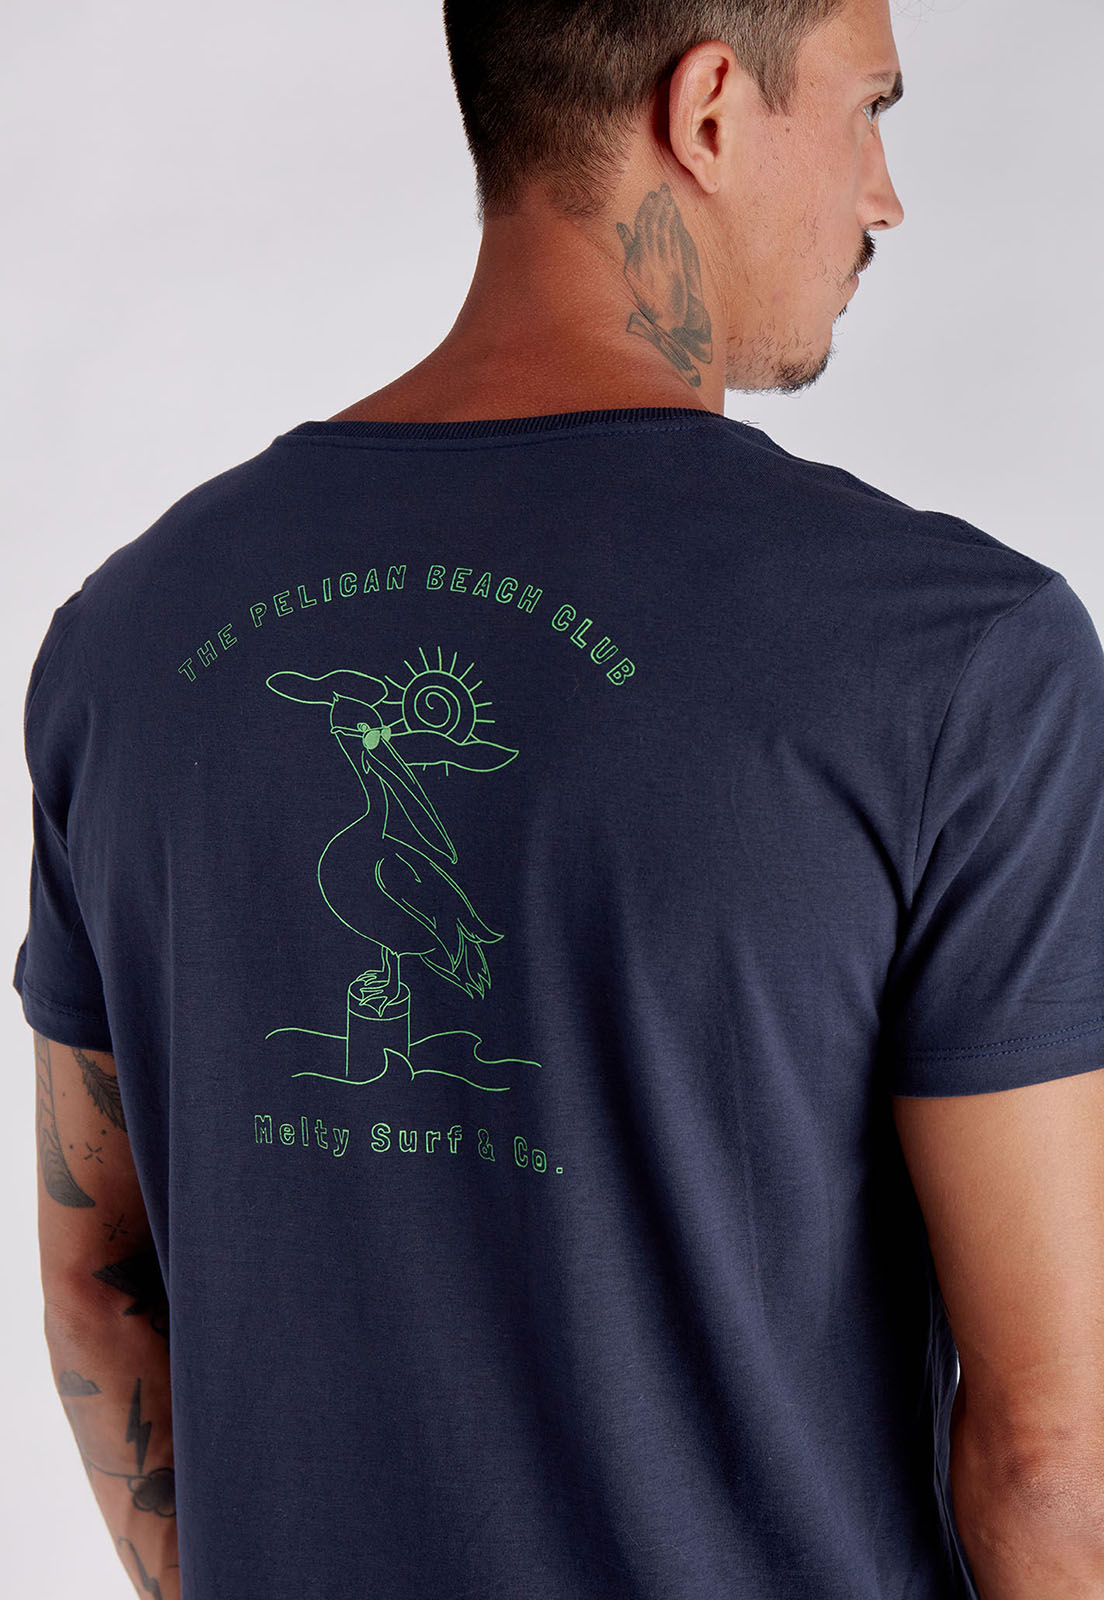 T-shirt Pelican Beach Marinho Melty  - melty surf & Co.